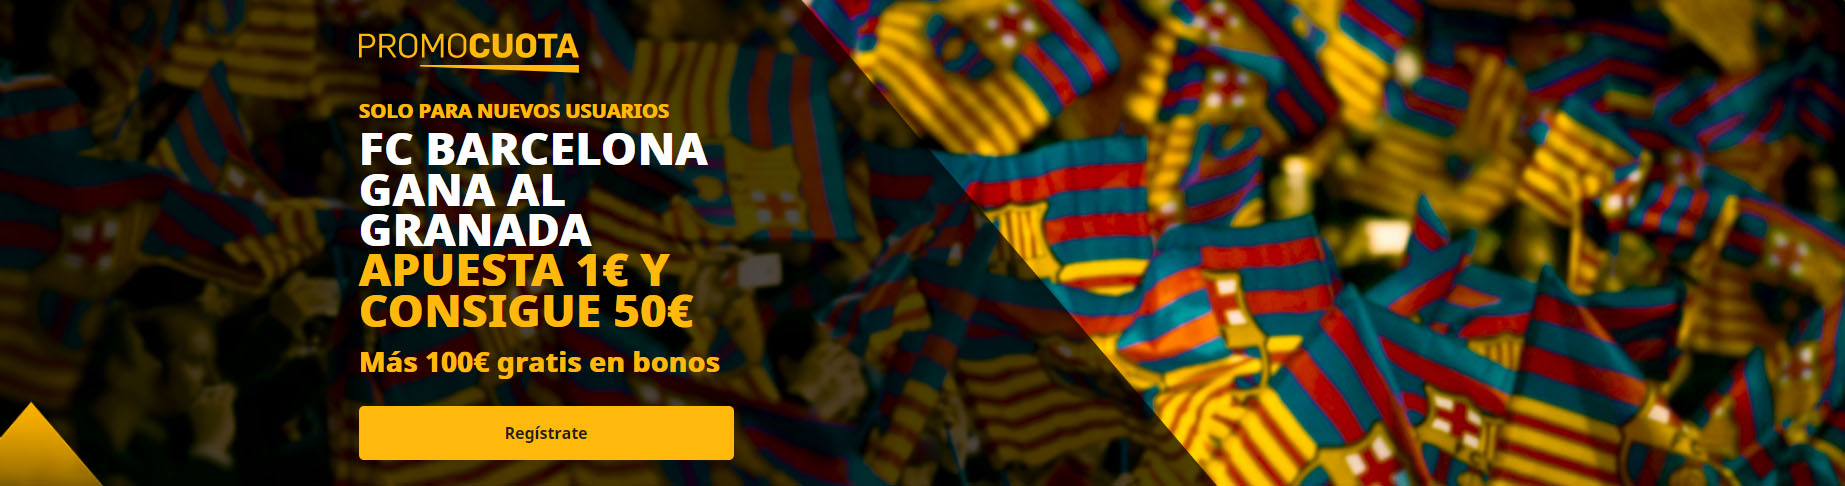 Promocuota Barcelona vence a Granada